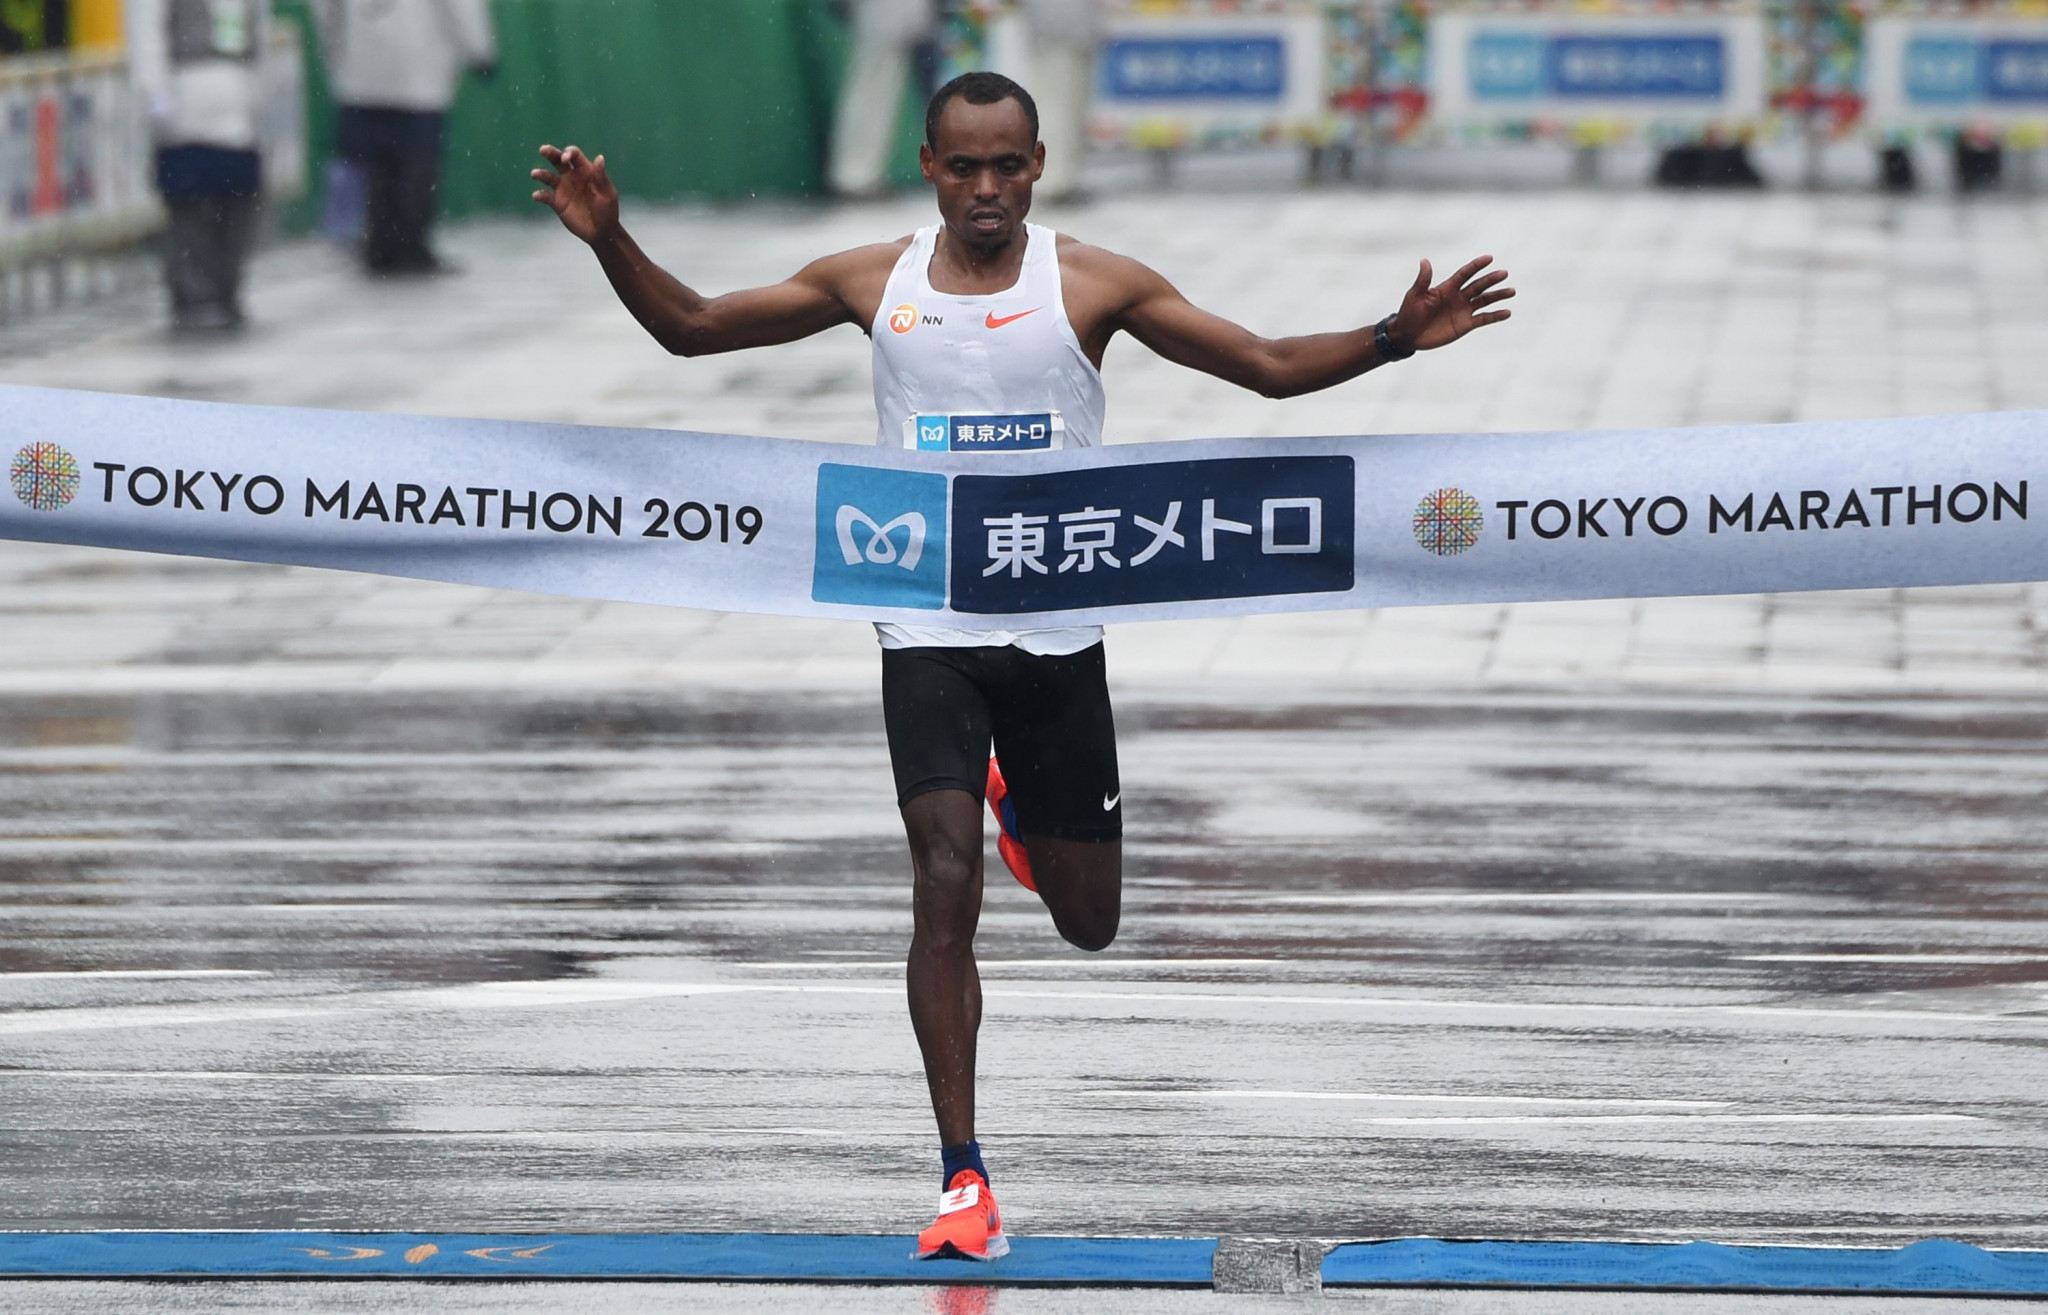 Legese and Aga aim to defend Tokyo Marathon titles